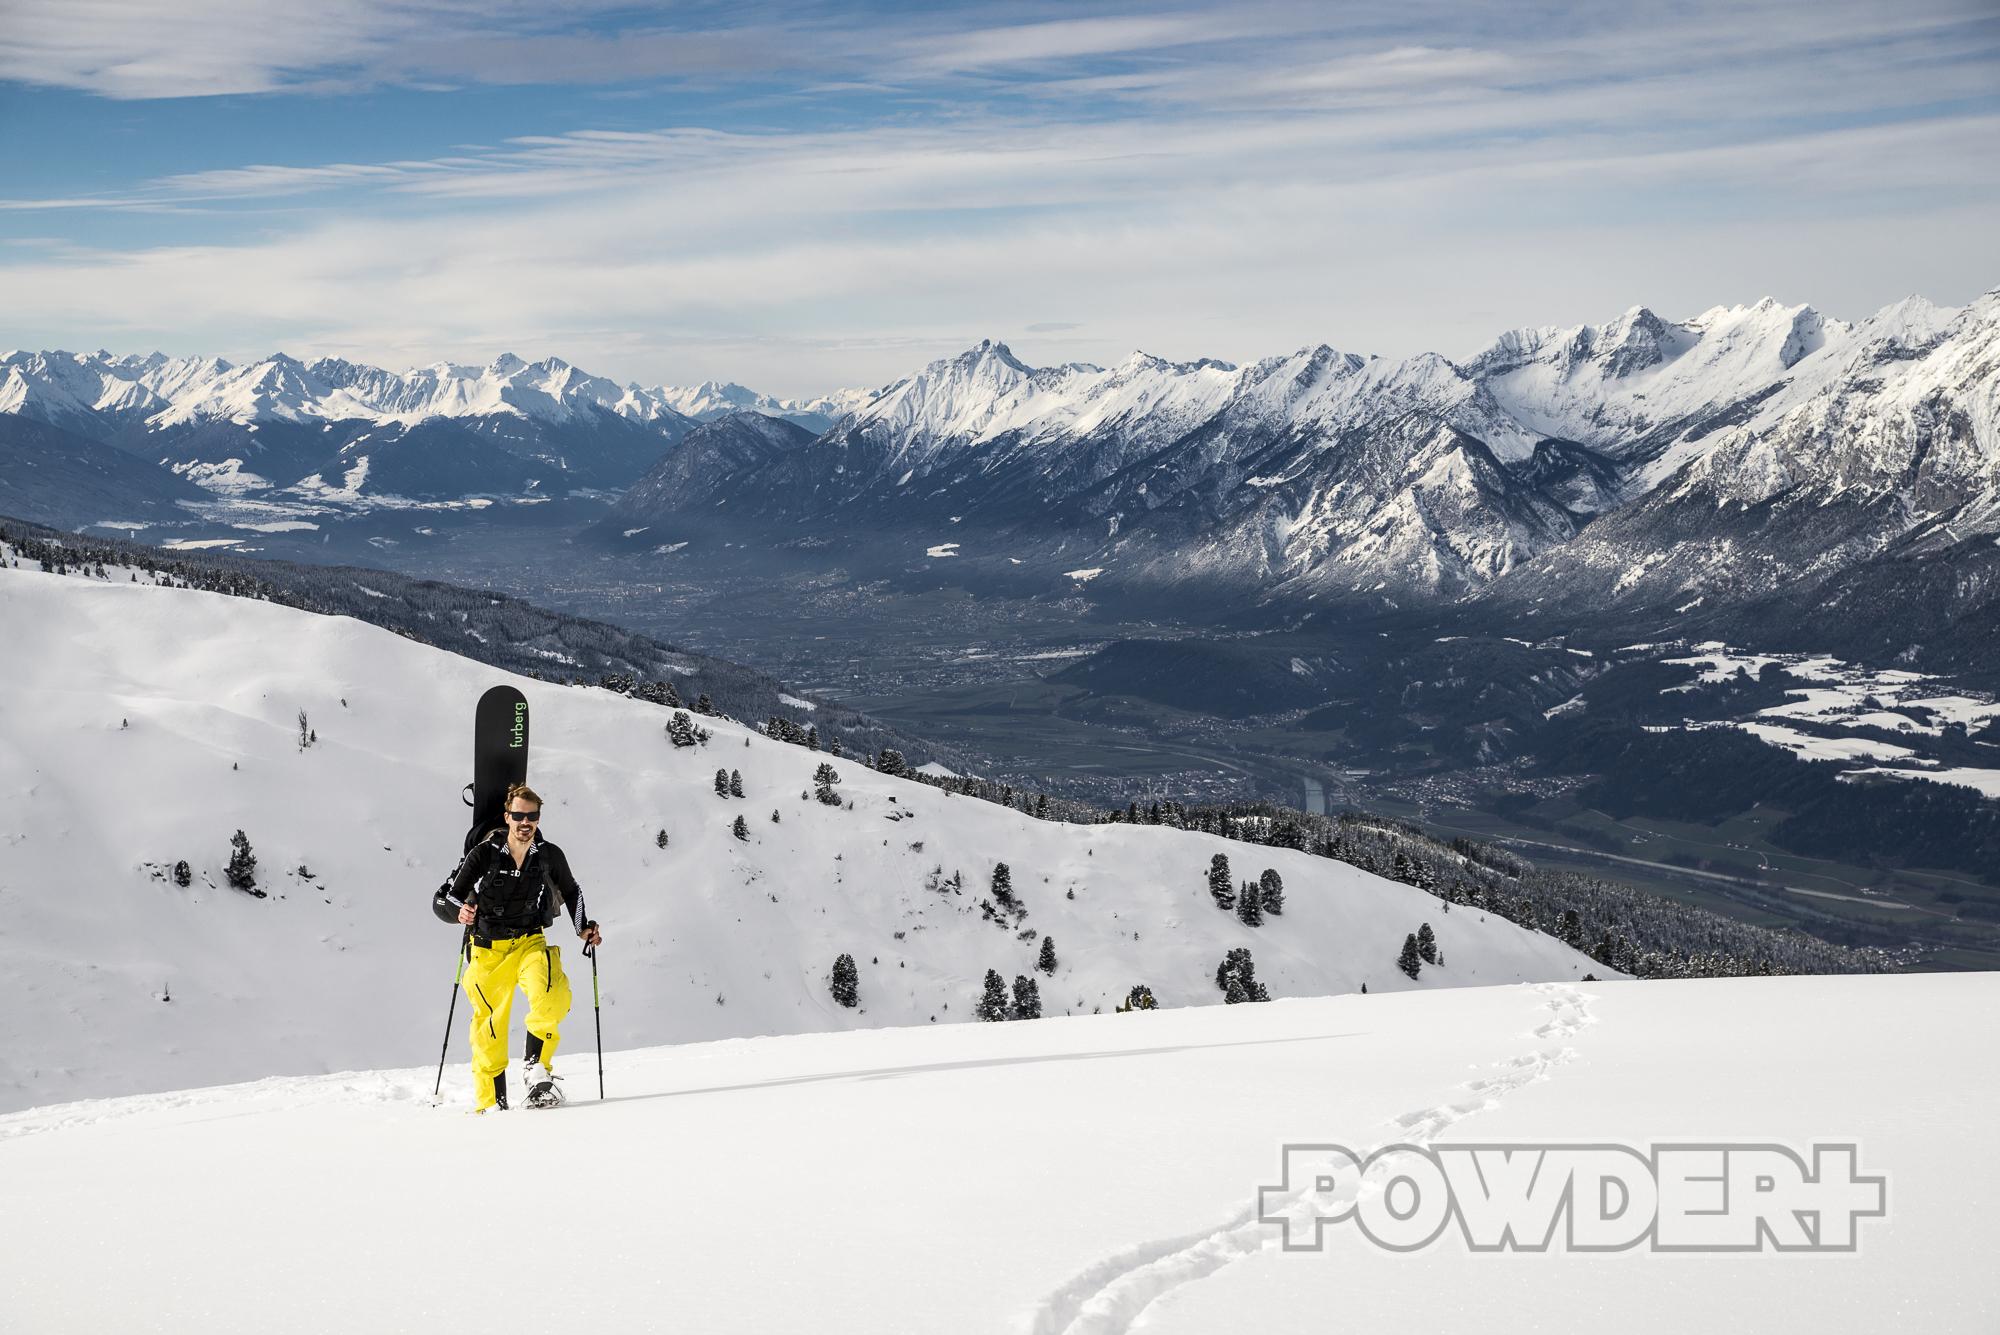 Gilfert, Skitour, Hochfügen, Sonntagsköpfl, LWS 3, LWD Tirol, Lawine Ostwand, Hochzillertal